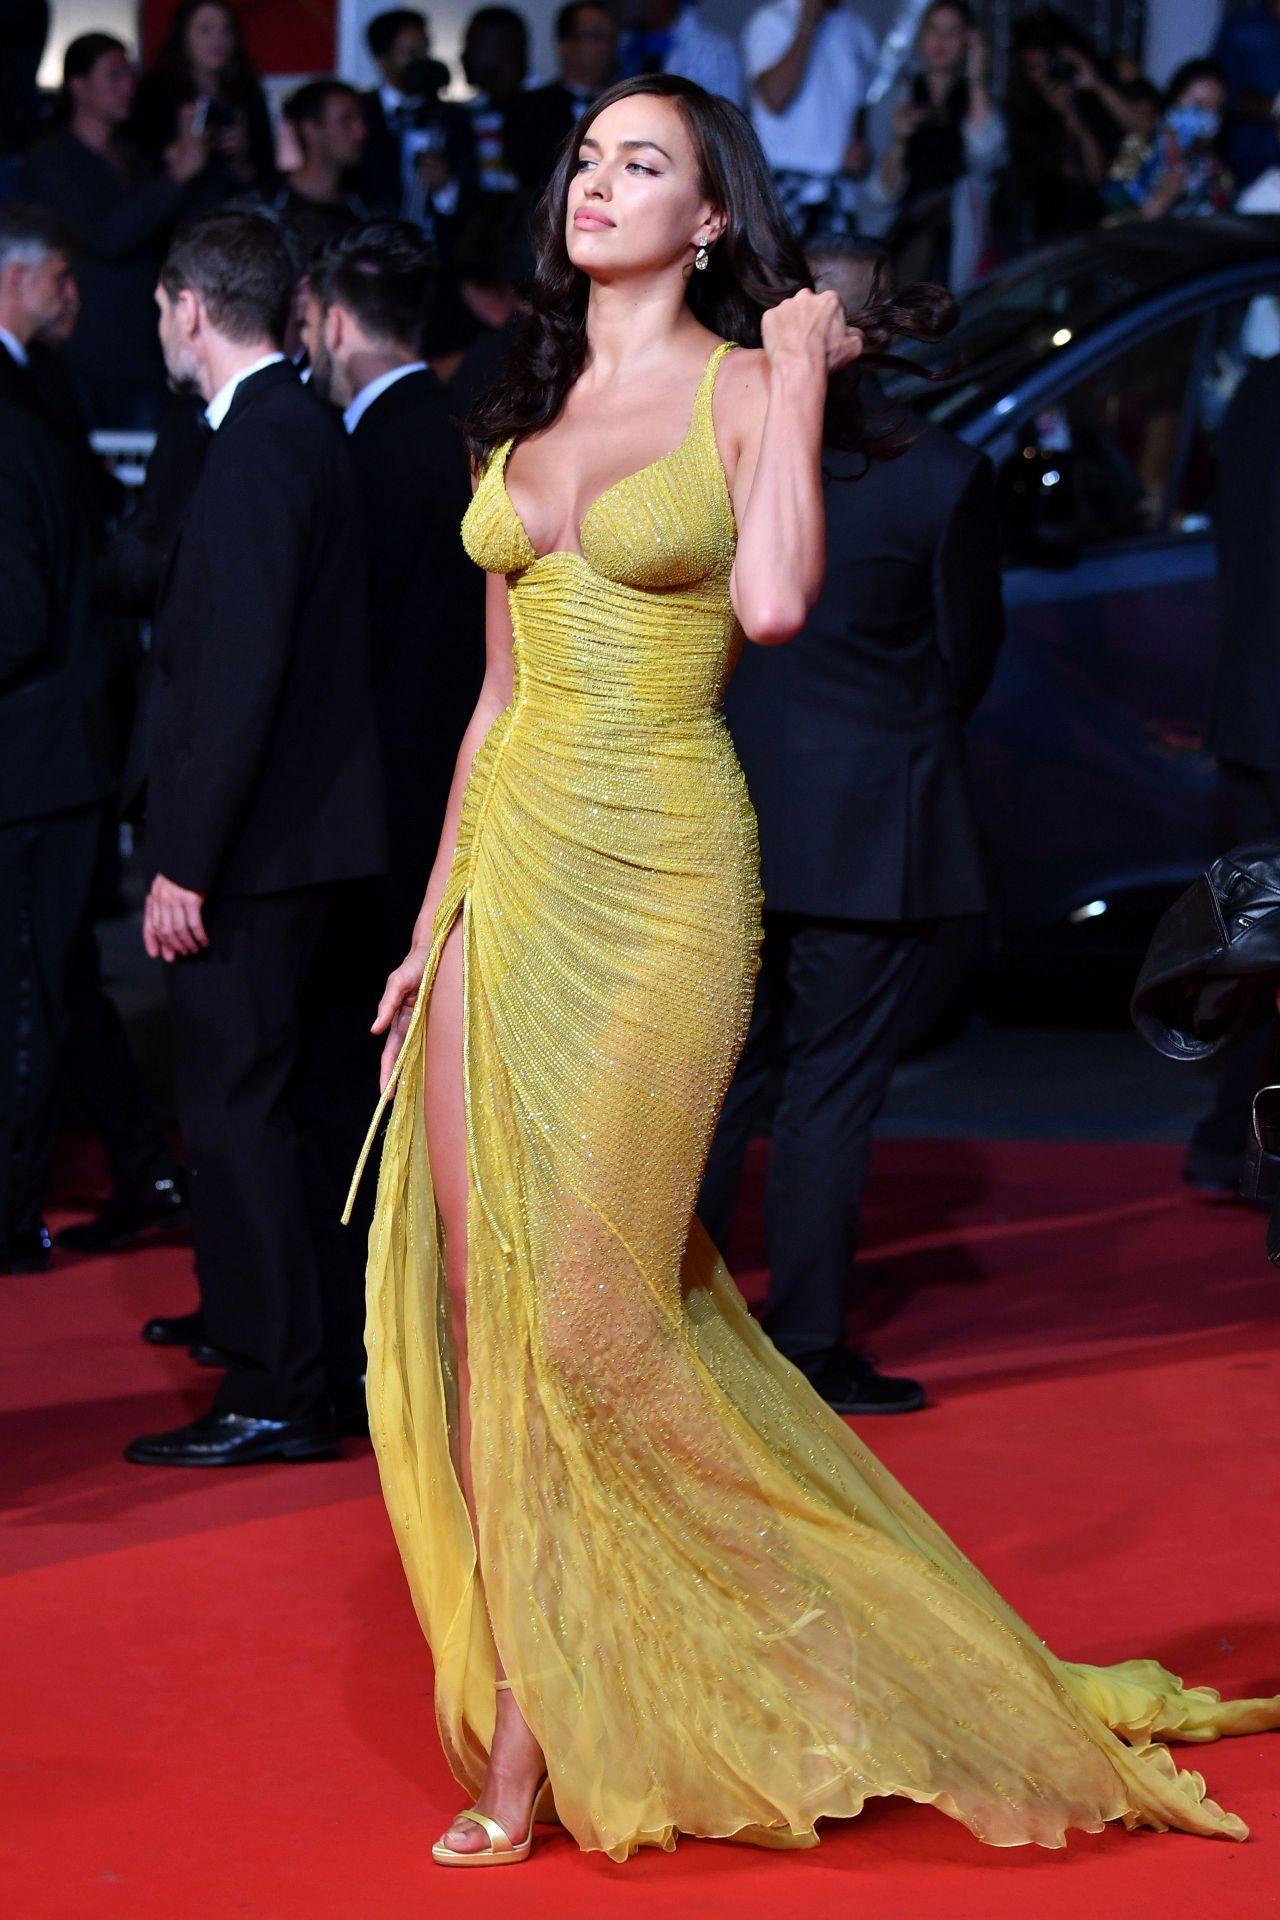 Irina Shayk Quot Hikari Quot Premiere At Cannes Film Festival 05